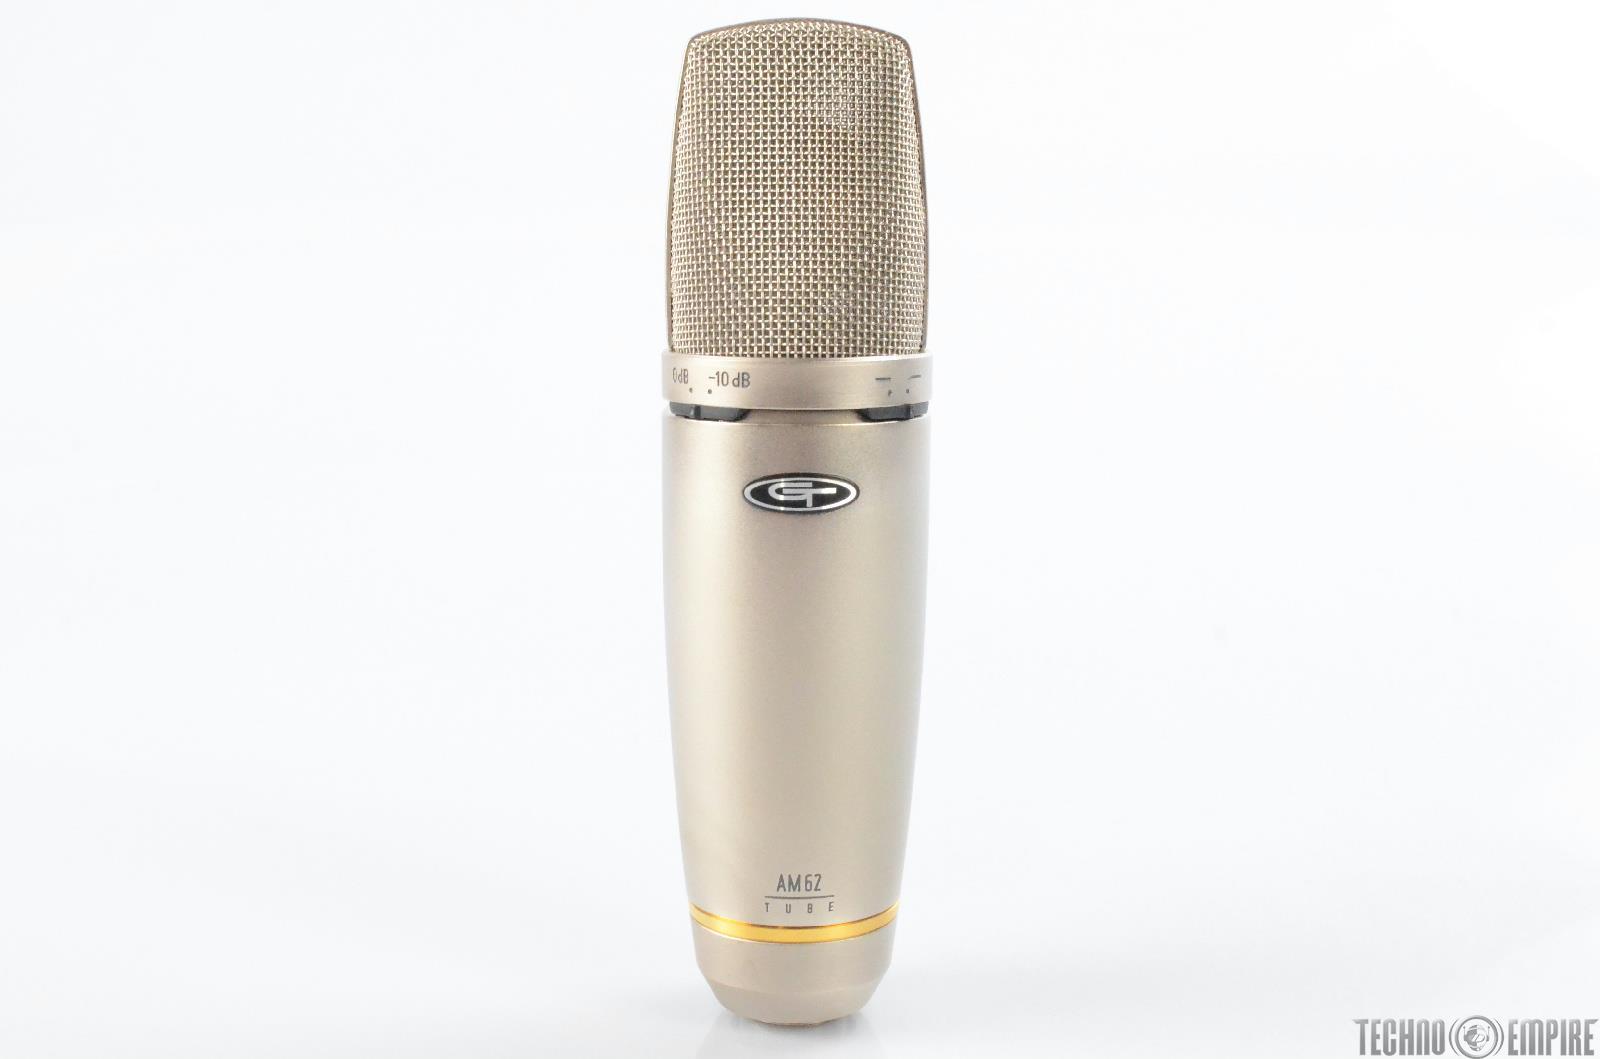 Alesis Groove Tubes GT AM62 Tube Condenser Microphone Studio Mic #28949